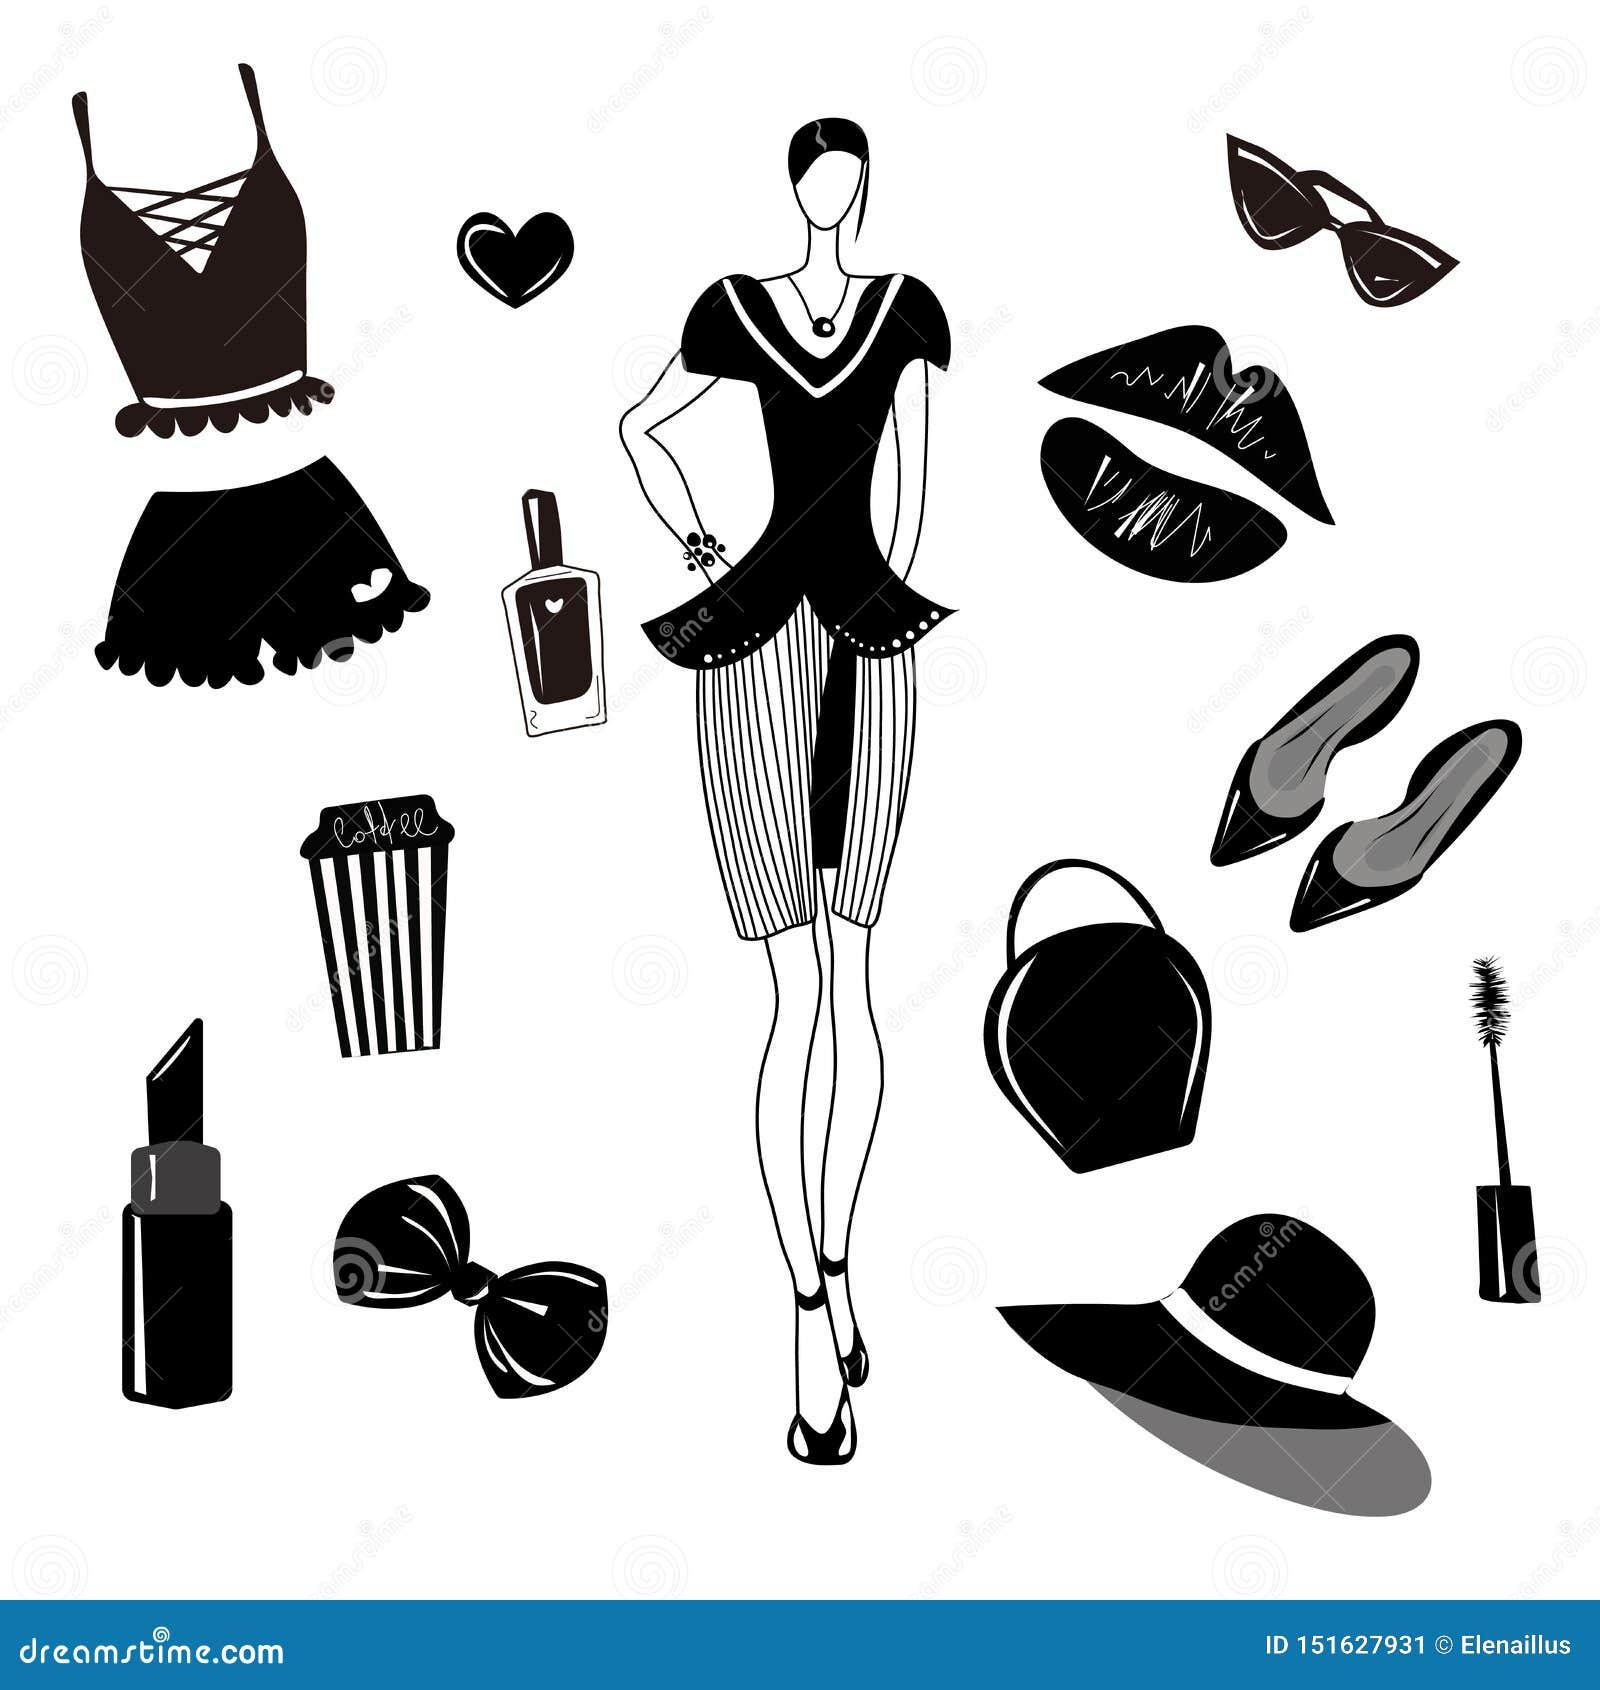 a0bb7d1f5ebf4 Elegant, trendy, stylish hand drawn elements. Isolated. Clip art. More  similar stock illustrations